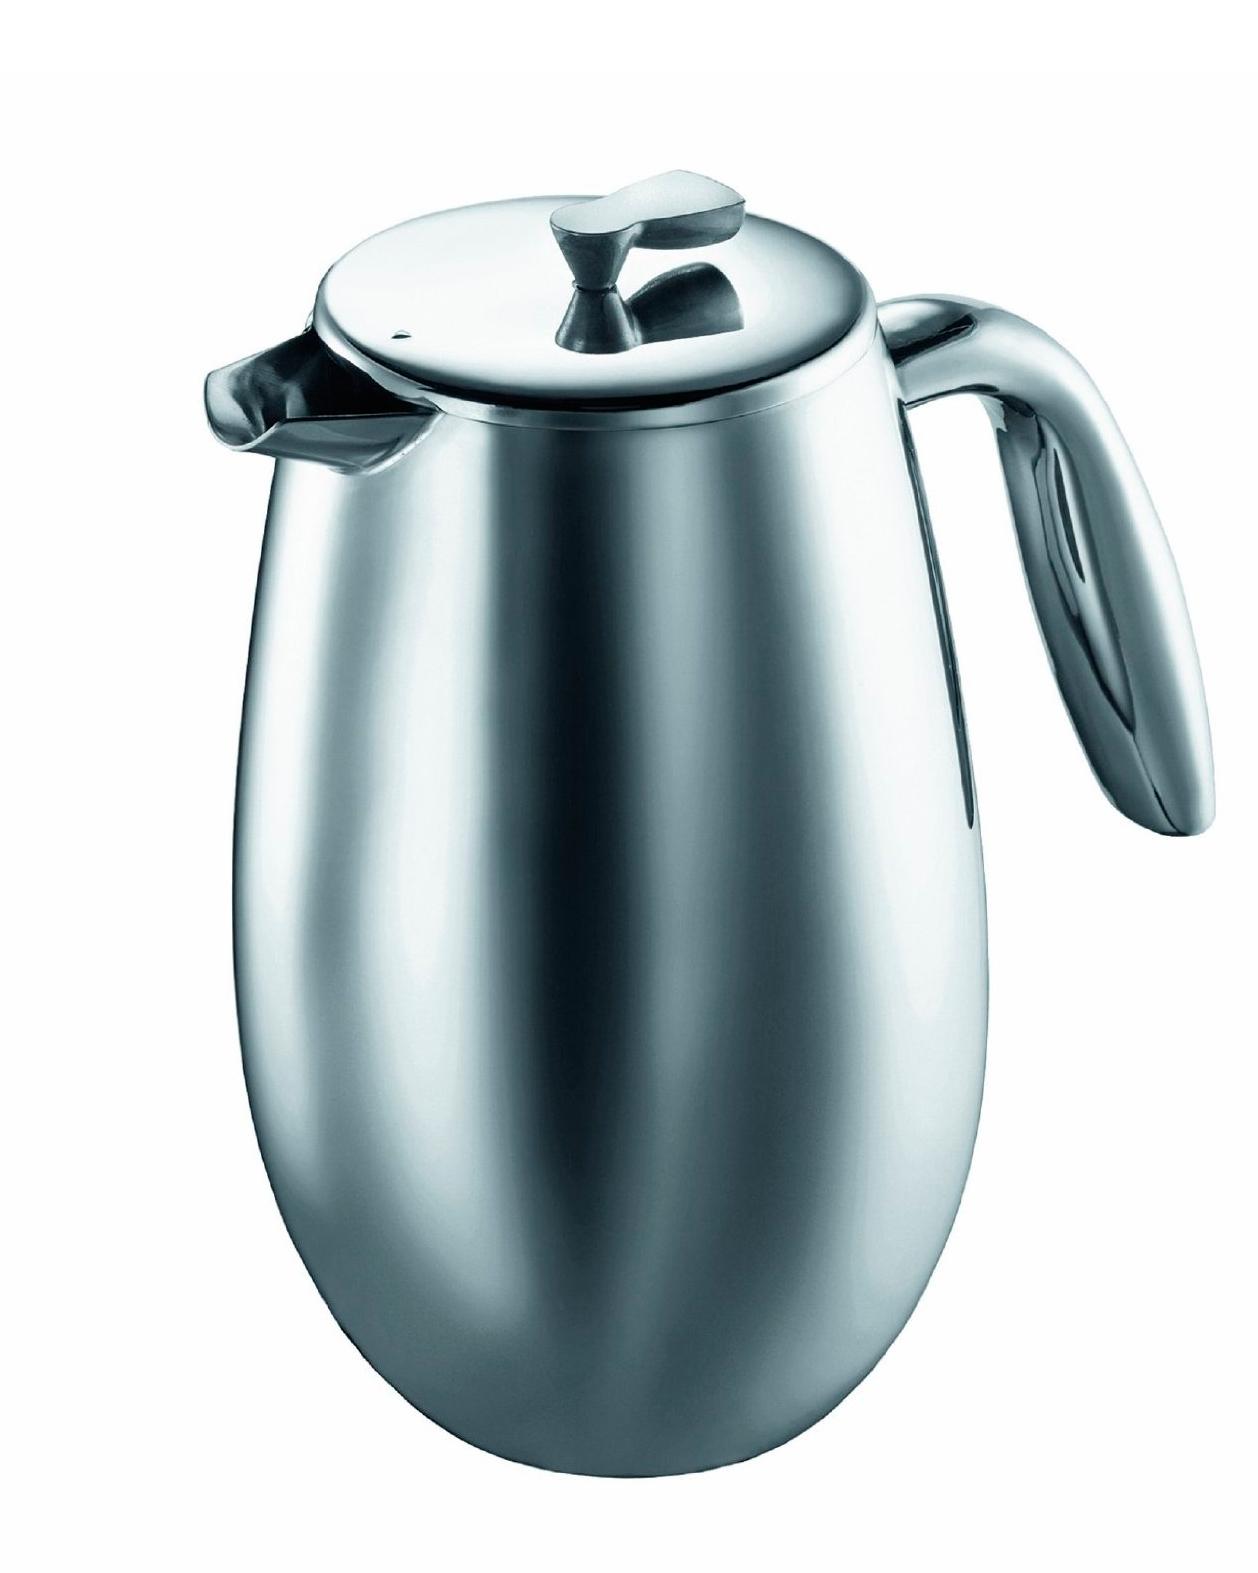 coffee-makers-registry-bodum-french-press-0914.jpg